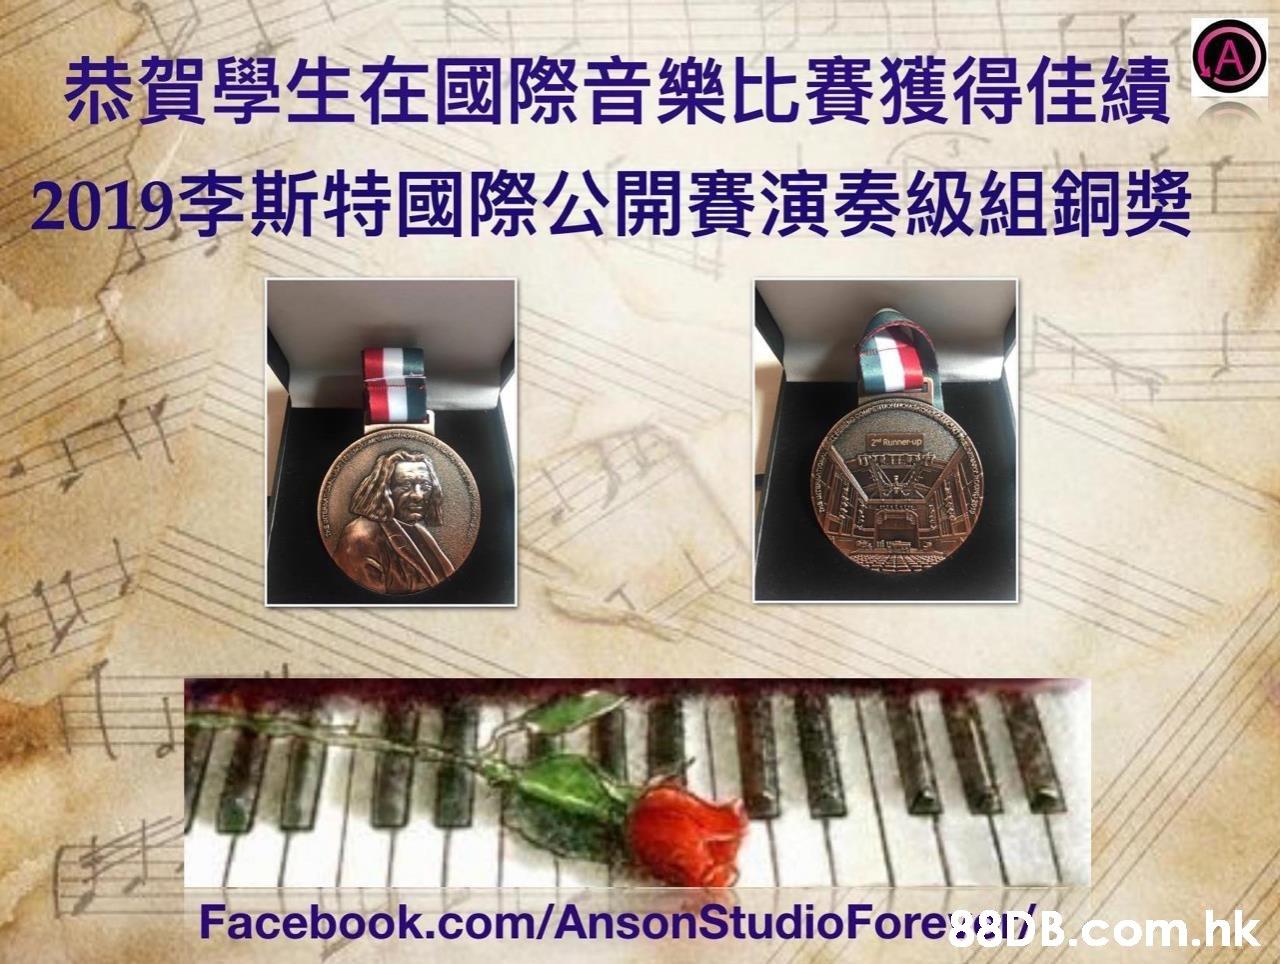 (A) 恭賀學生在國際音樂比賽獲得佳績 2019李斯特國際公開賽演奏級組銅獎 Runner up Facebook.com/AnsonStudioFore::1DB.com.hk  Product,Glass bottle,Bottle,Liqueur,